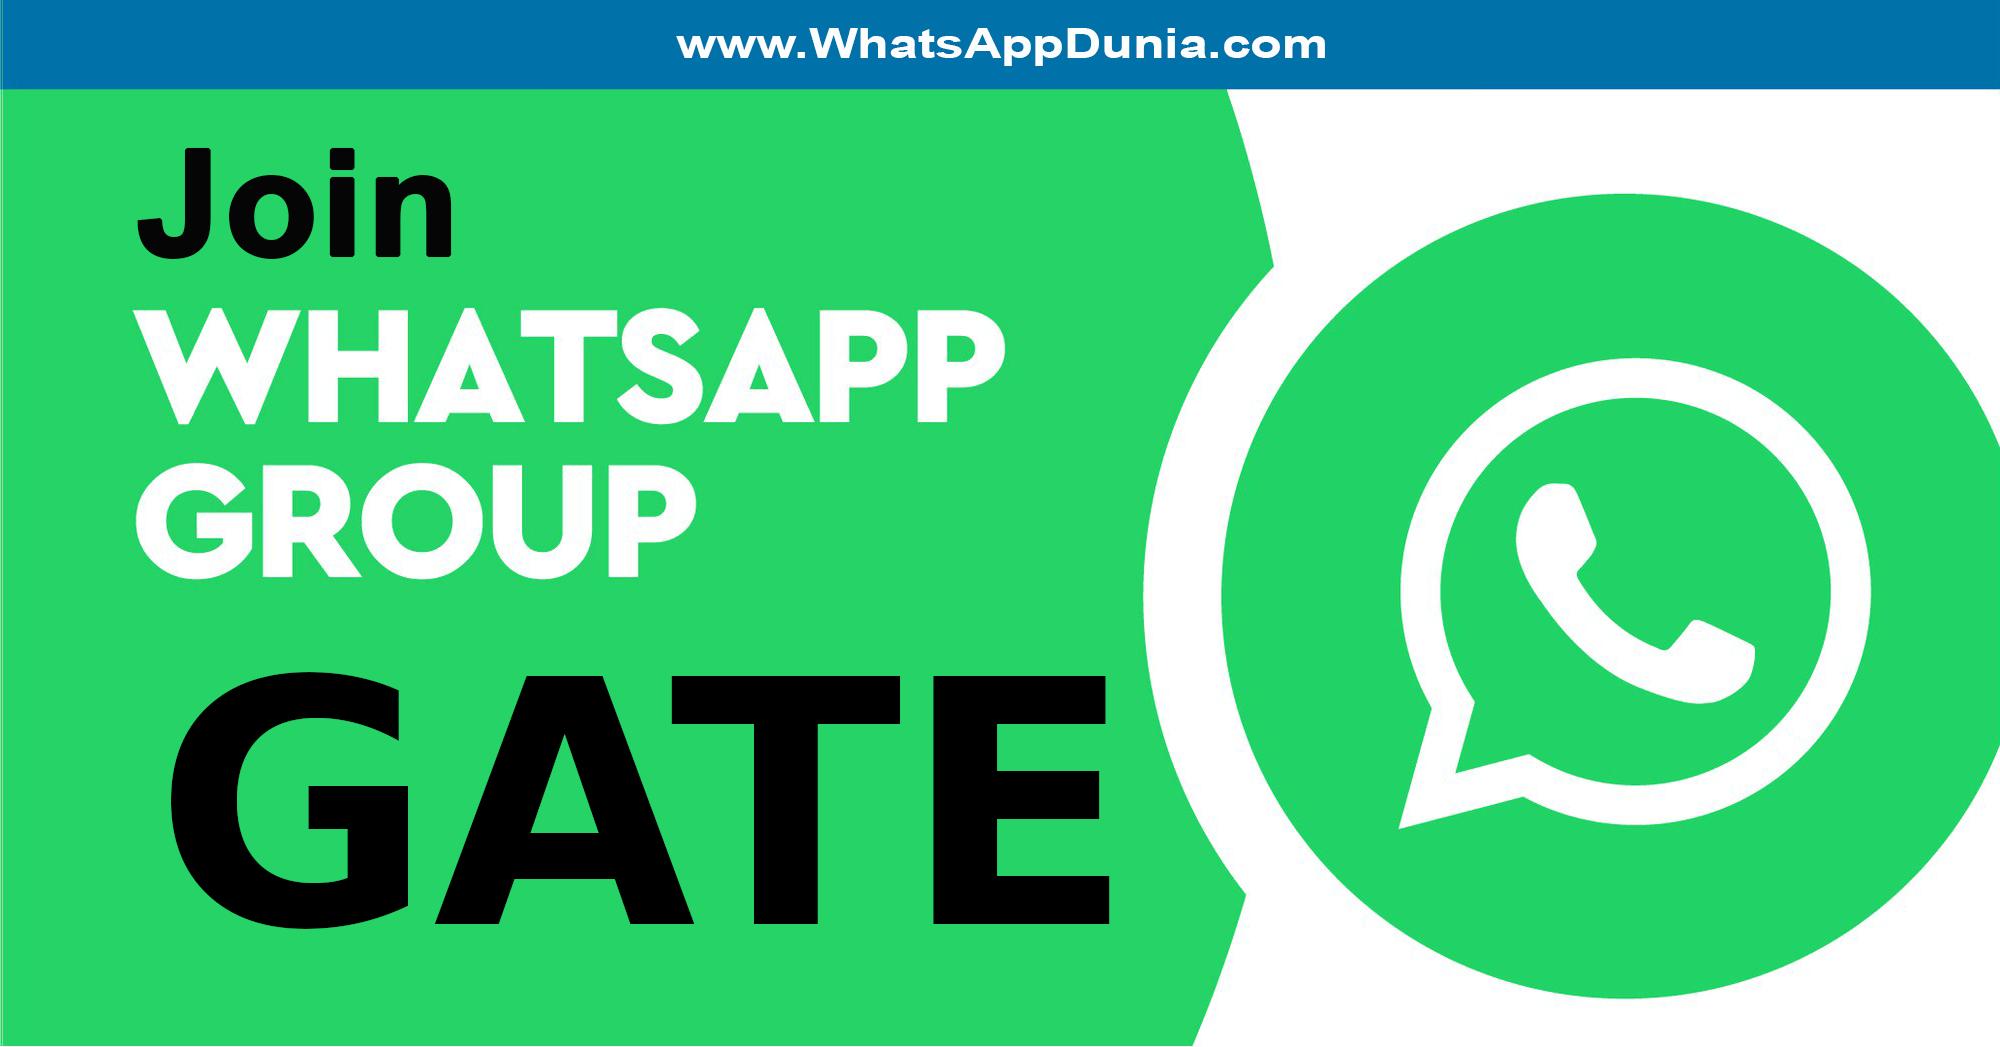 GATE WhatsApp Group Links